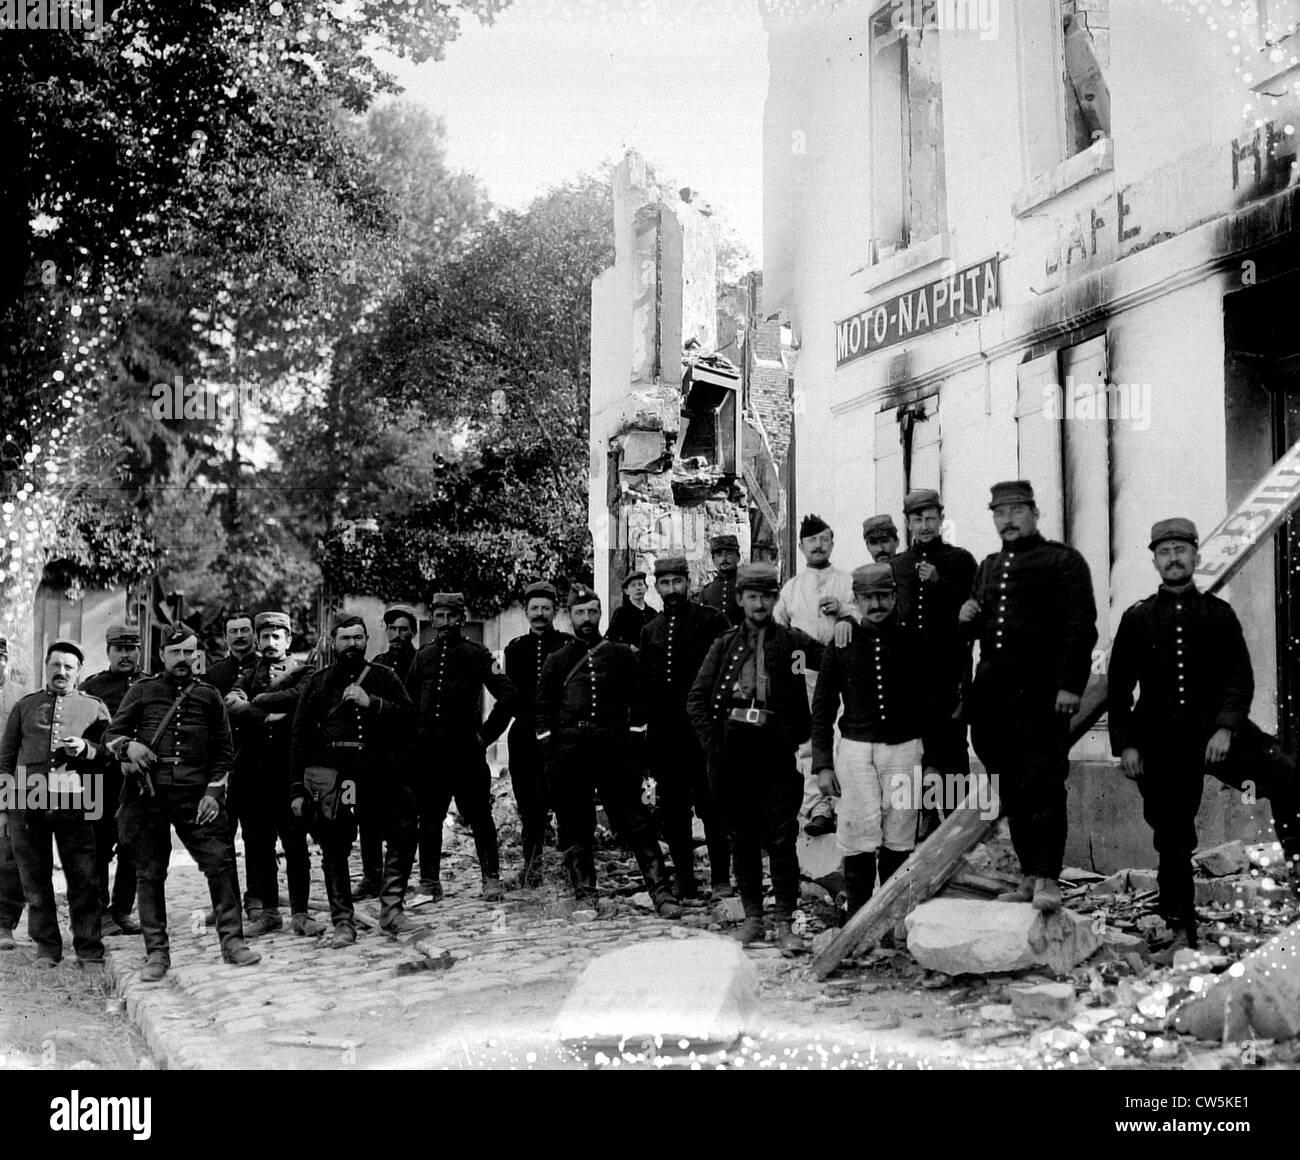 Choisy au Bac occupied by French artillerymen, 1914 - Stock Image